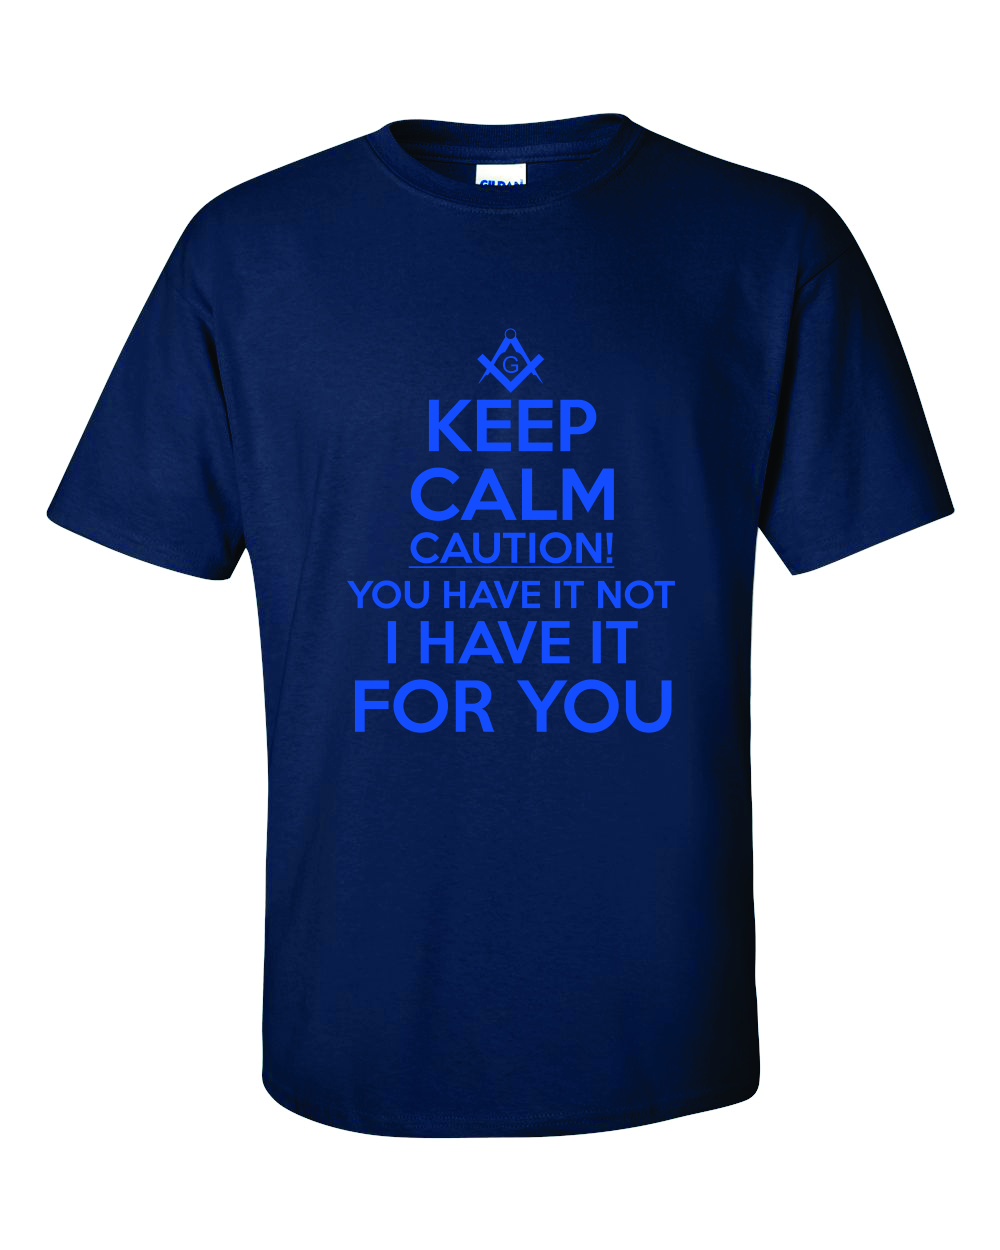 Masonic Keep Calm Caution Navy Blue Royal Blue Print T Shirt On